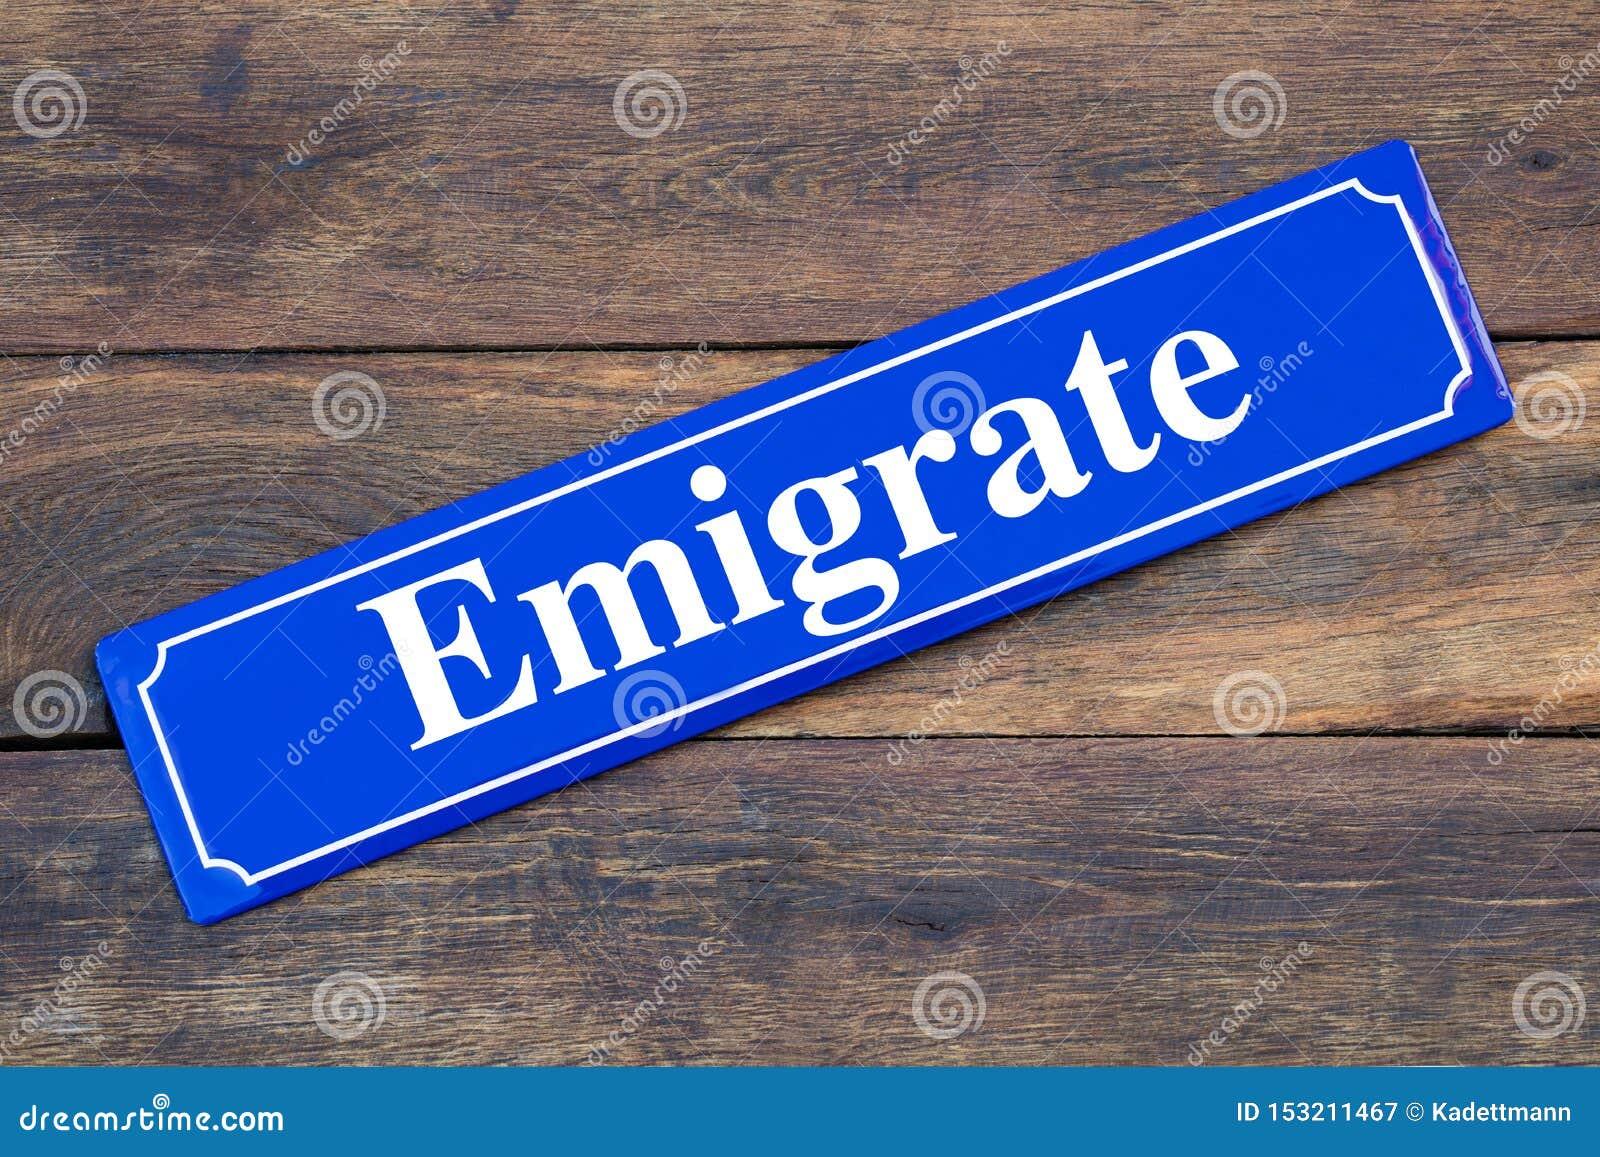 Emigrate street sign on wooden background